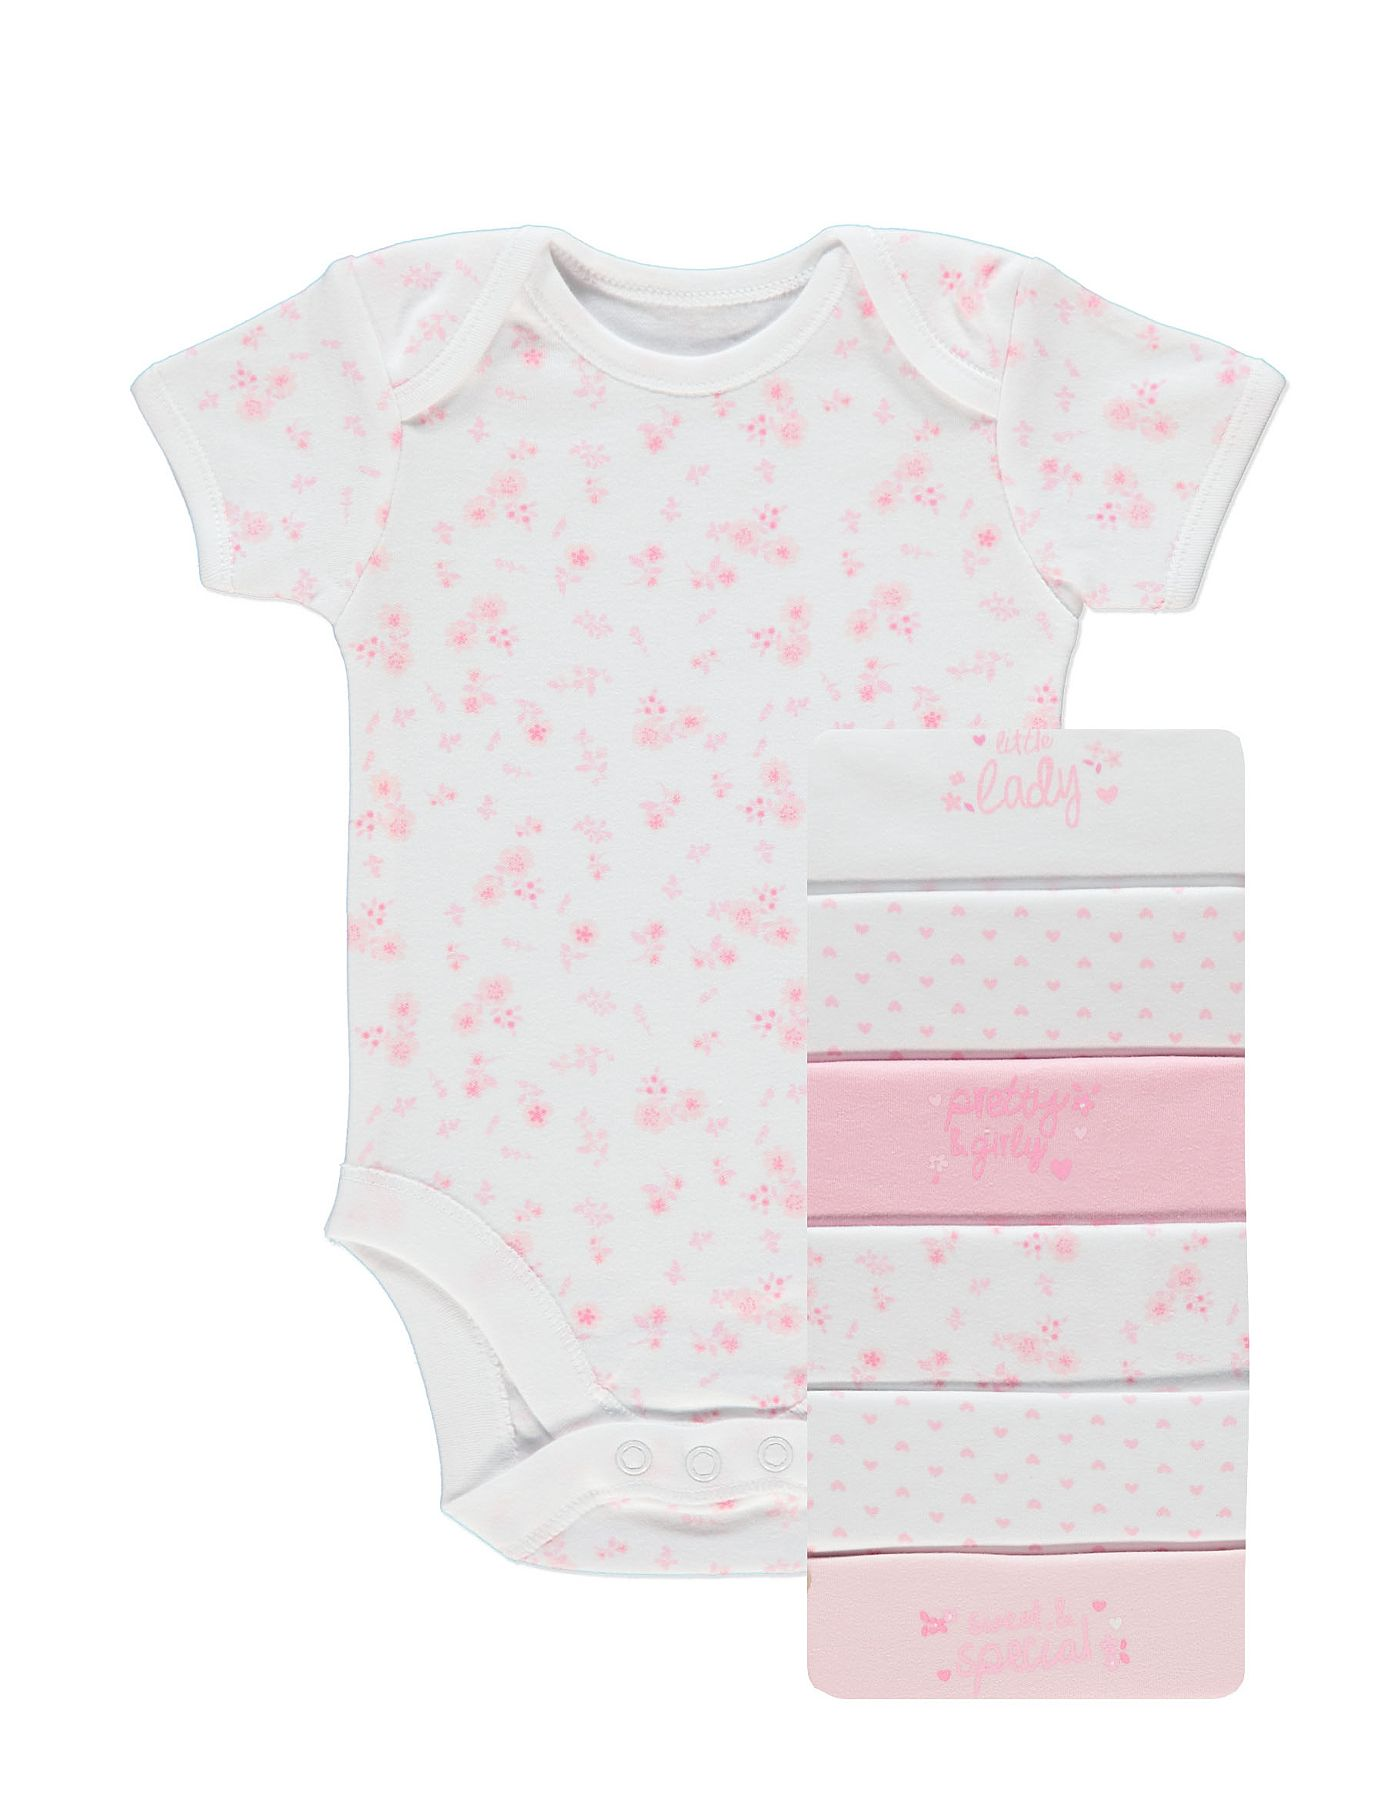 White apron asda - 7 Pack Short Sleeve Bodysuits Baby George At Asda